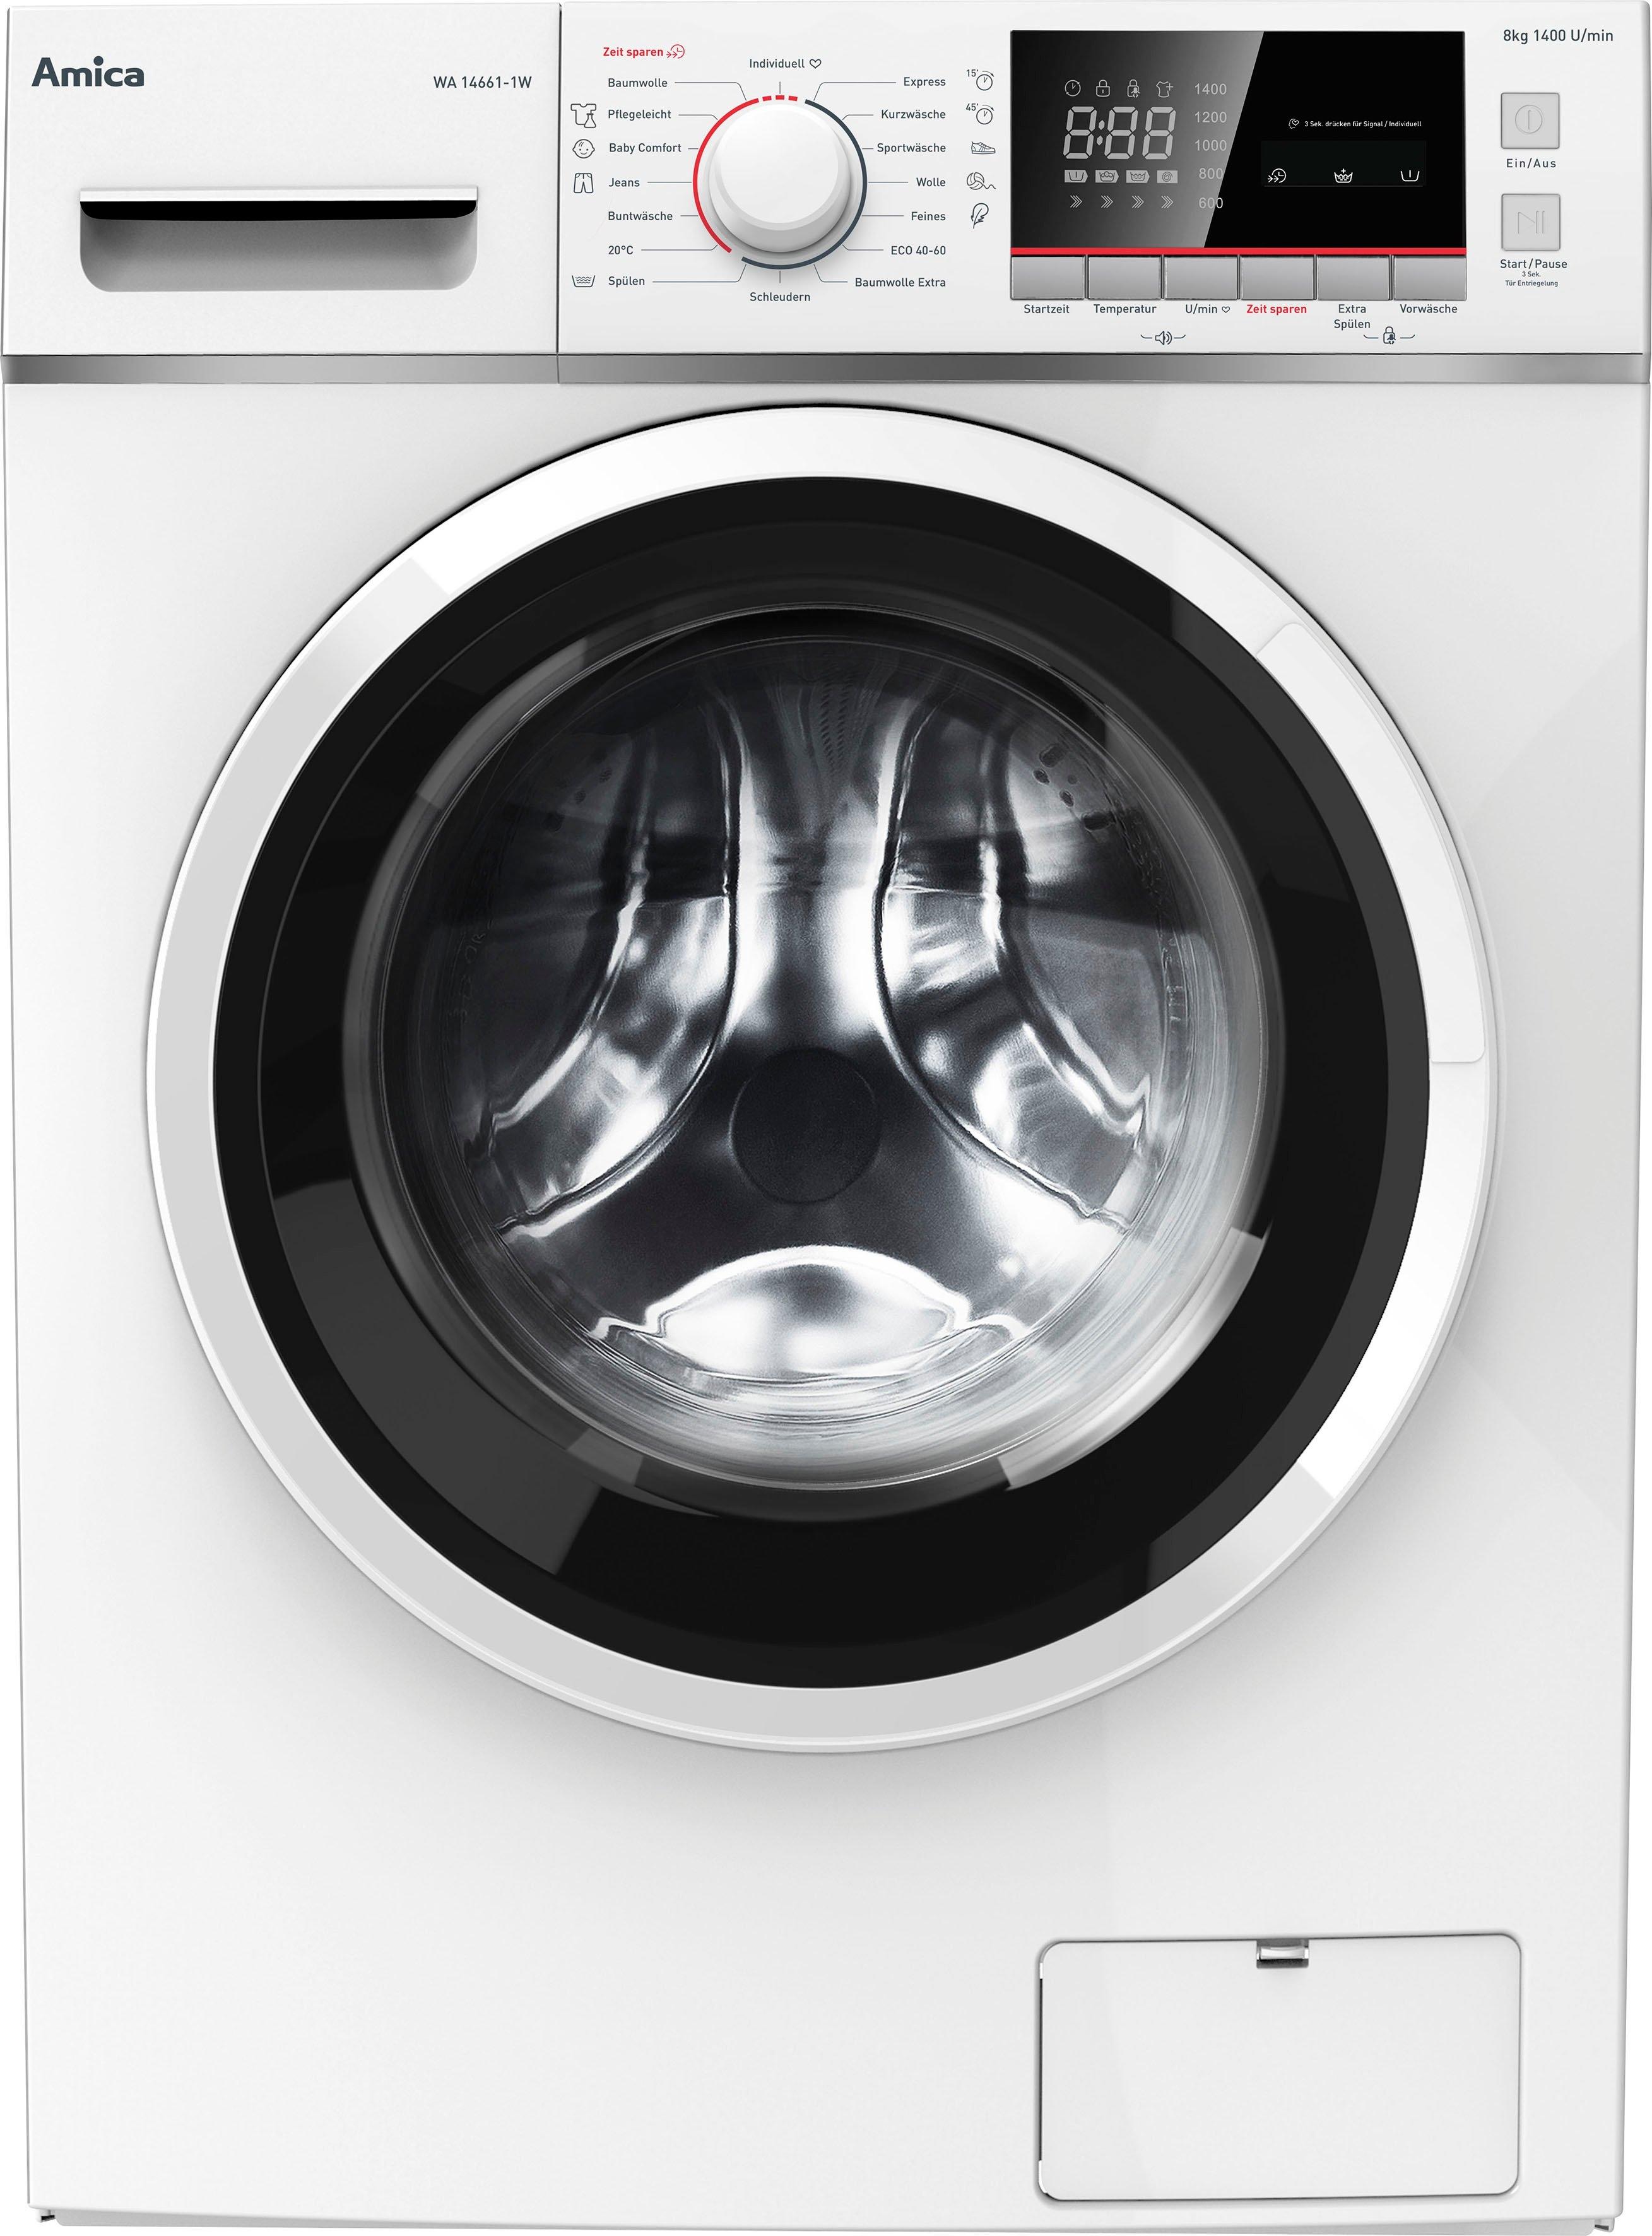 Amica »WA 14661 W« wasmachine bij OTTO online kopen